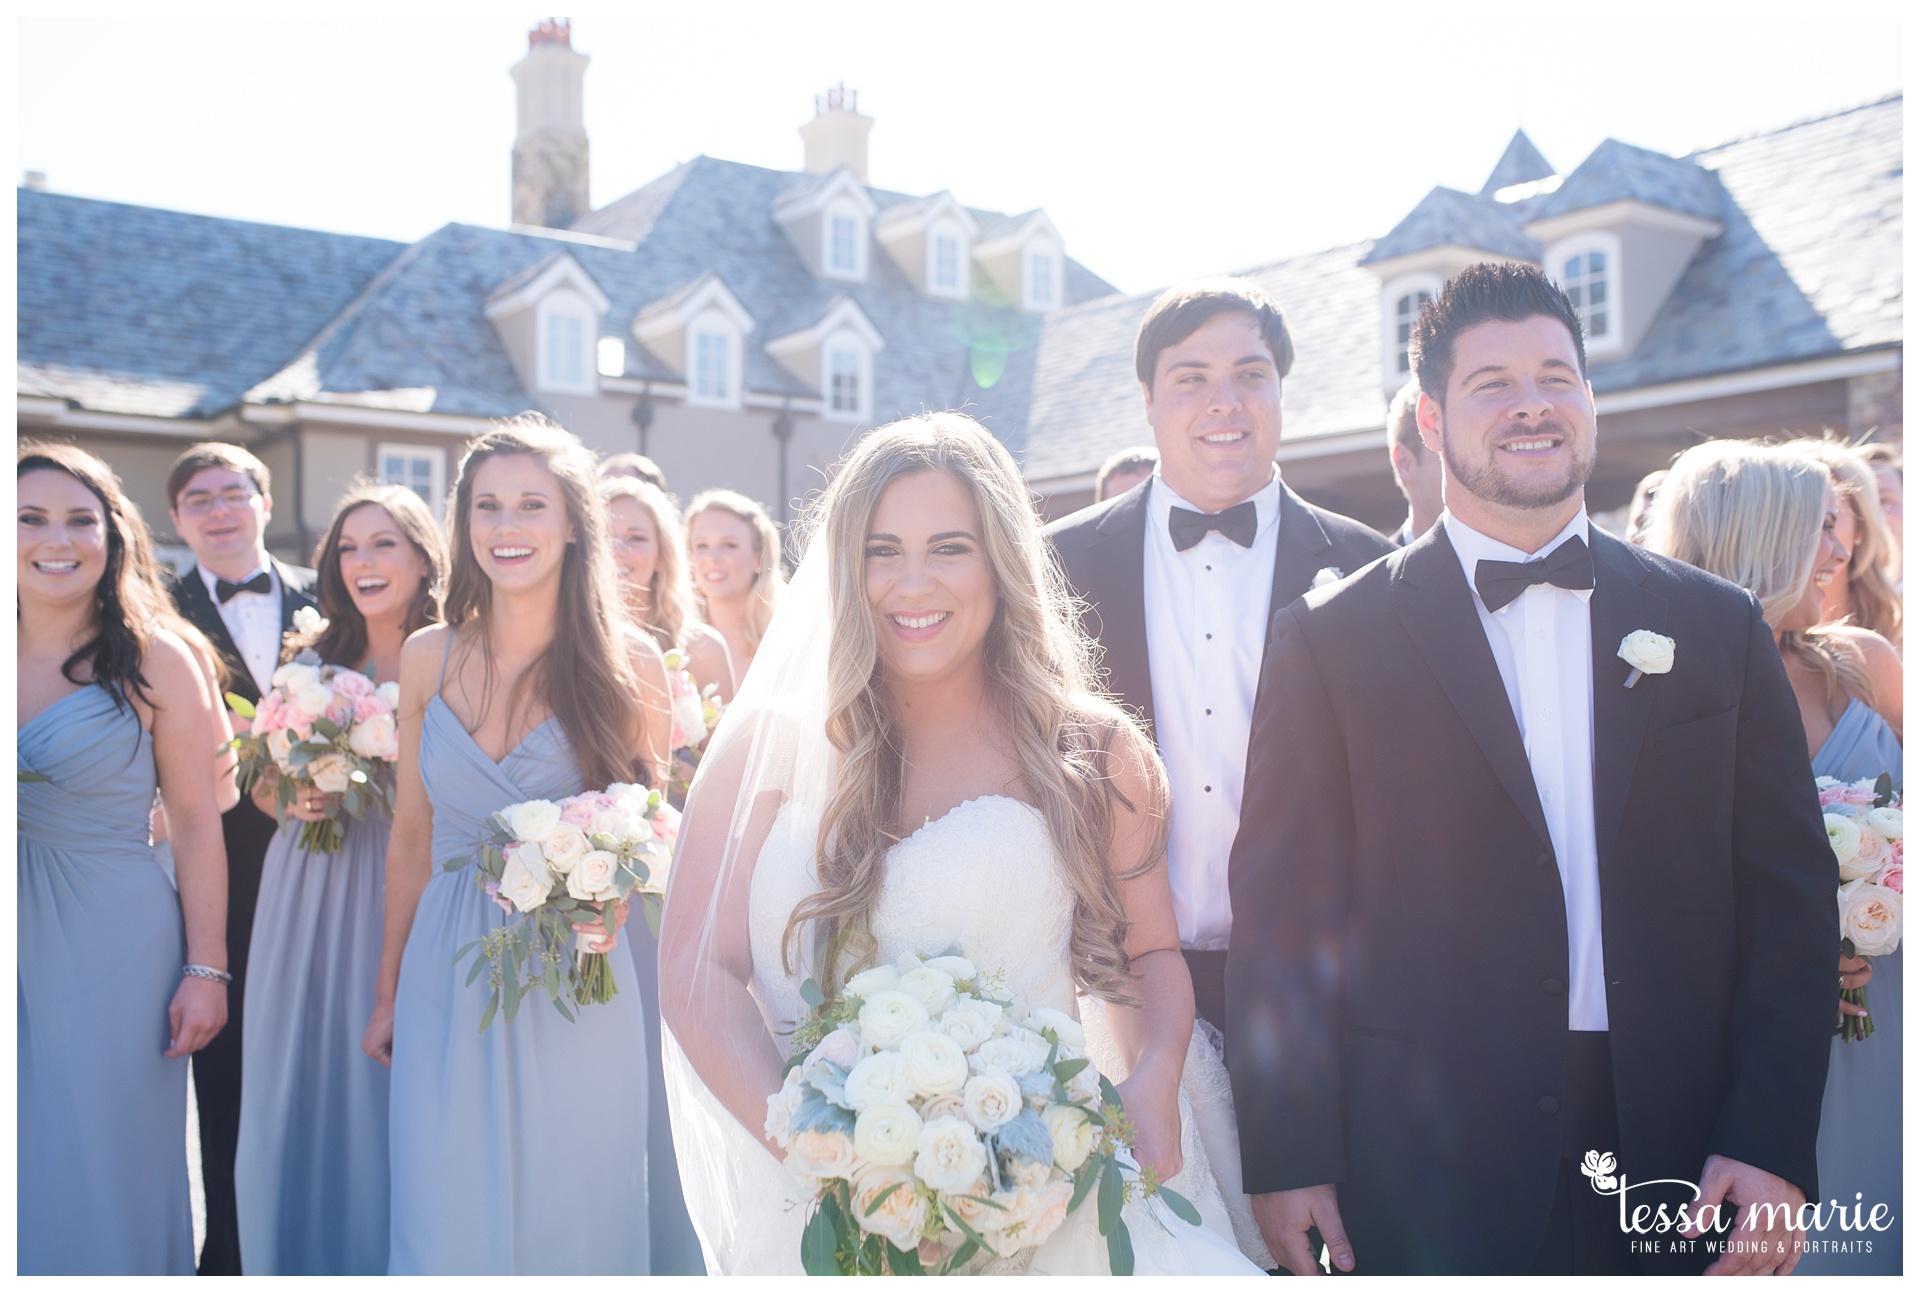 tessa_marie_weddings_legacy_story_focused_wedding_pictures_atlanta_wedding_photographer_0147